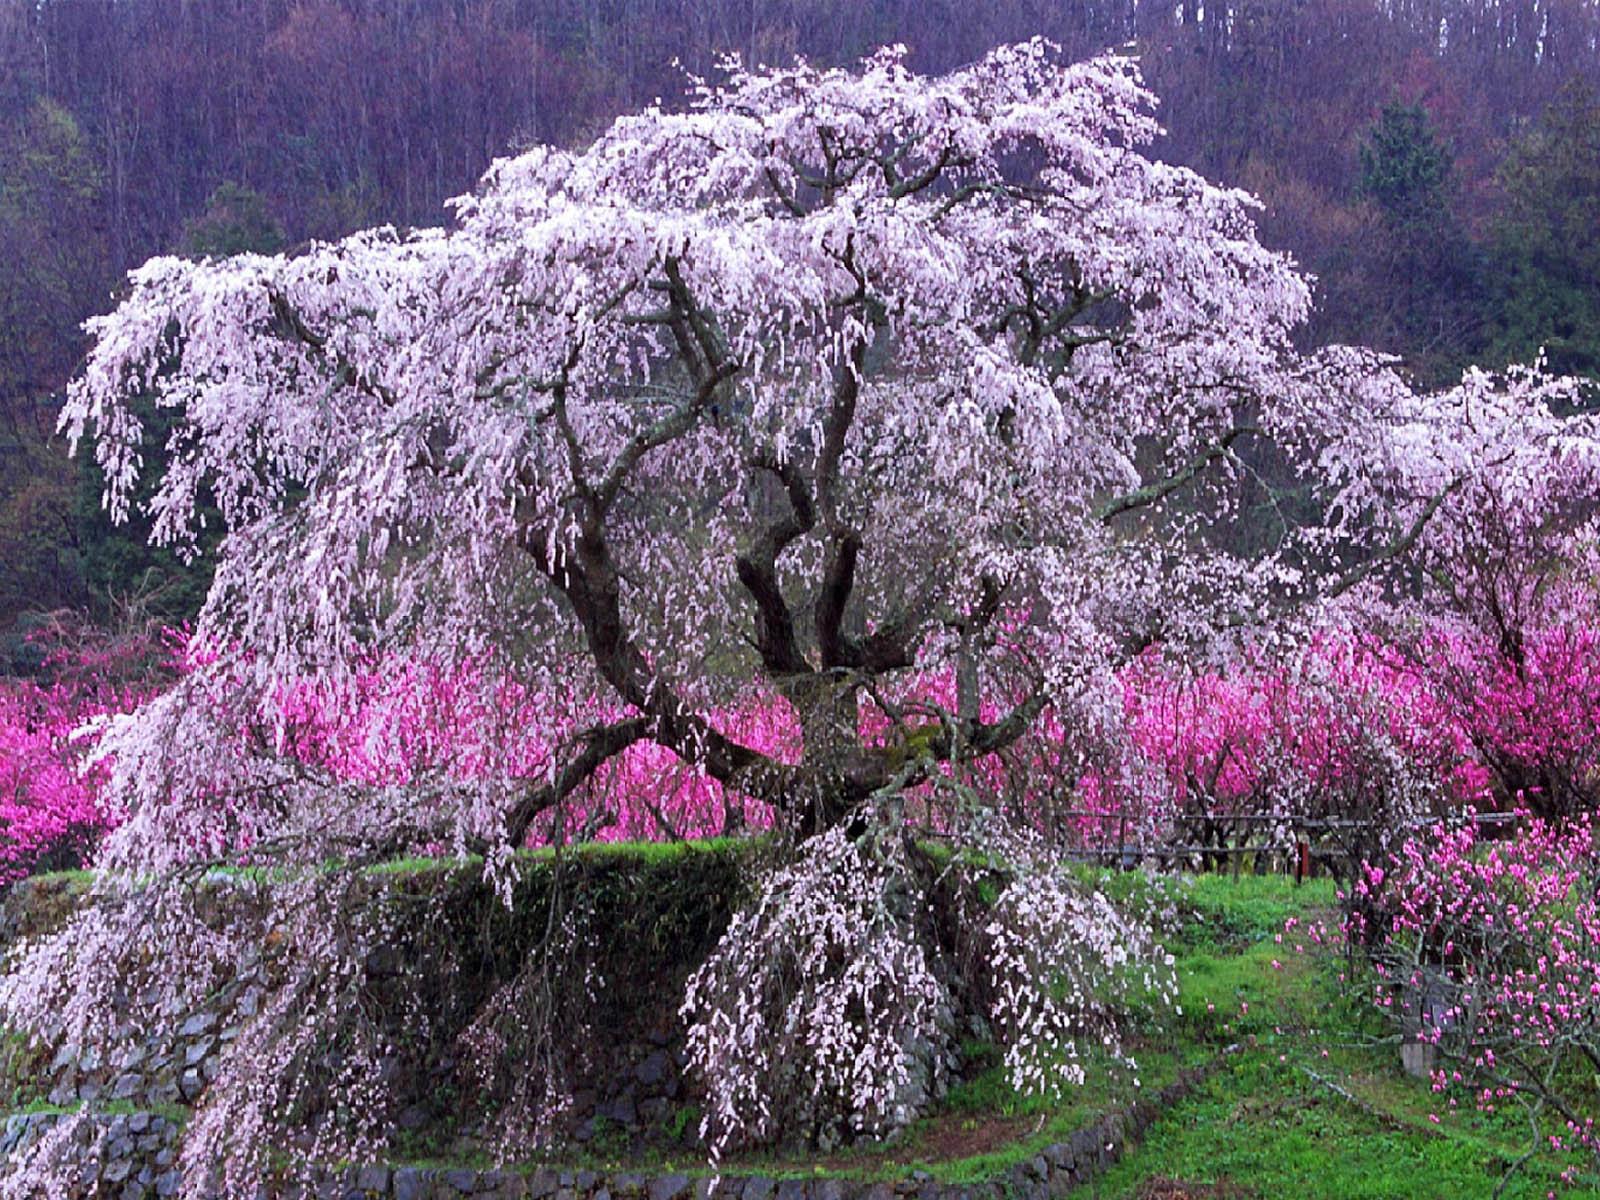 cherry blossem tree background wallpaper - photo #16